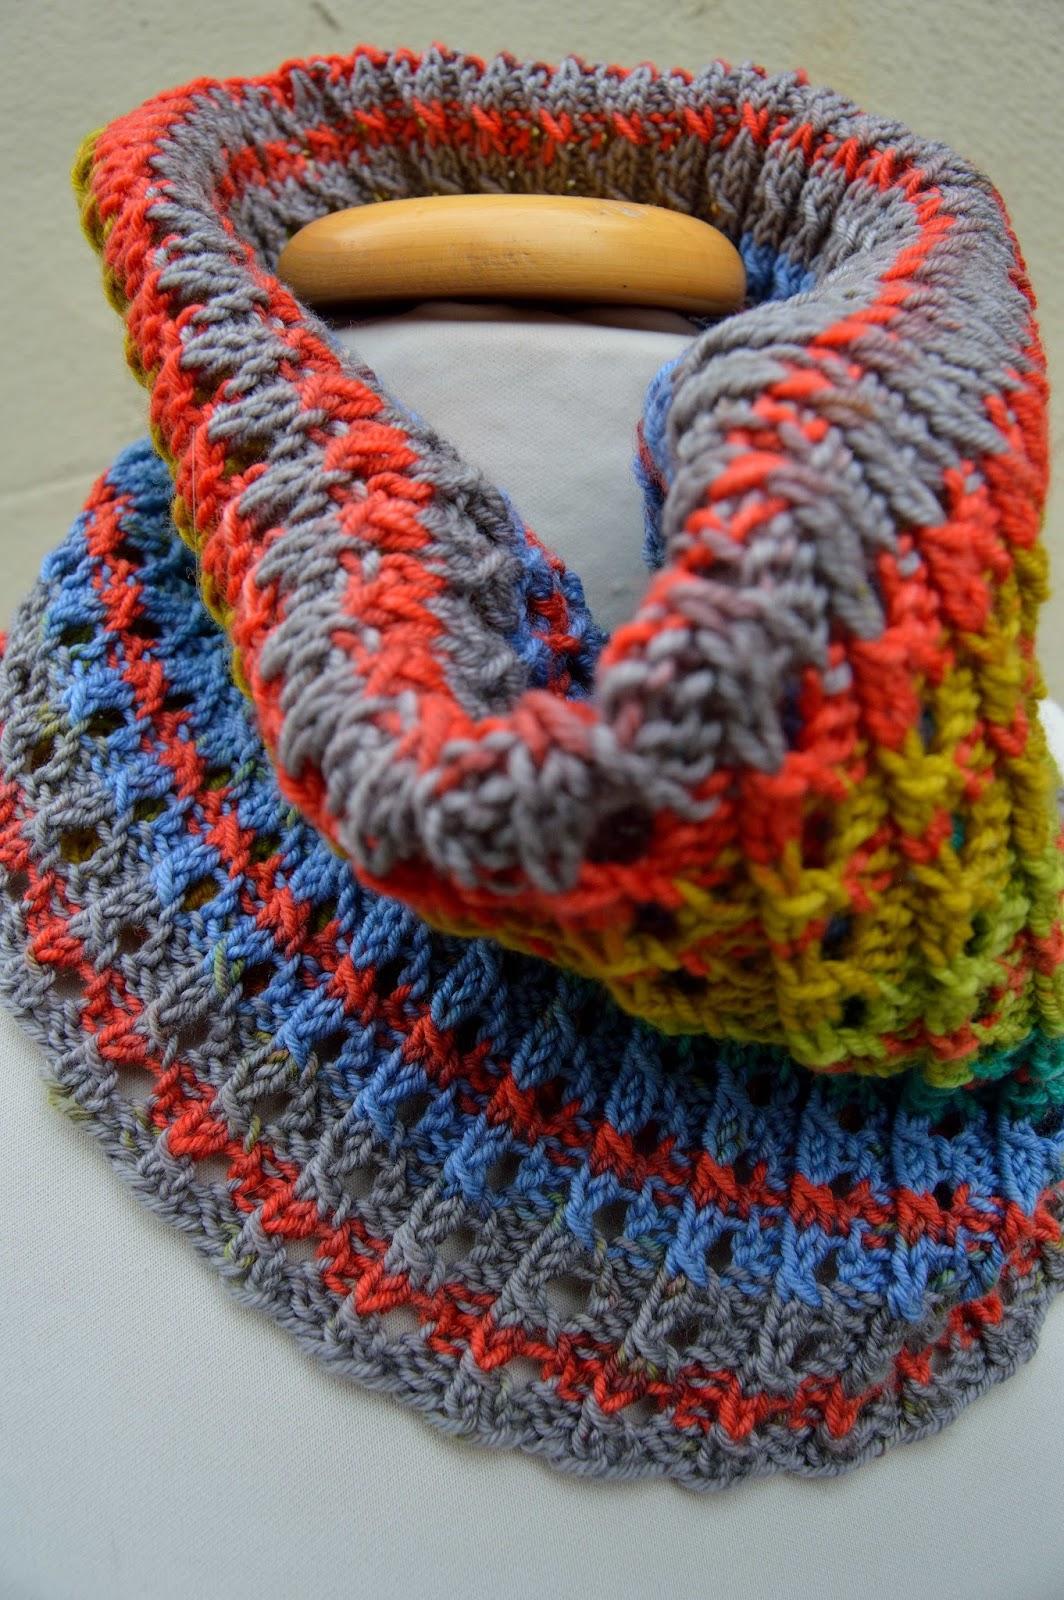 knitcat s gestrick farben f r die seele. Black Bedroom Furniture Sets. Home Design Ideas